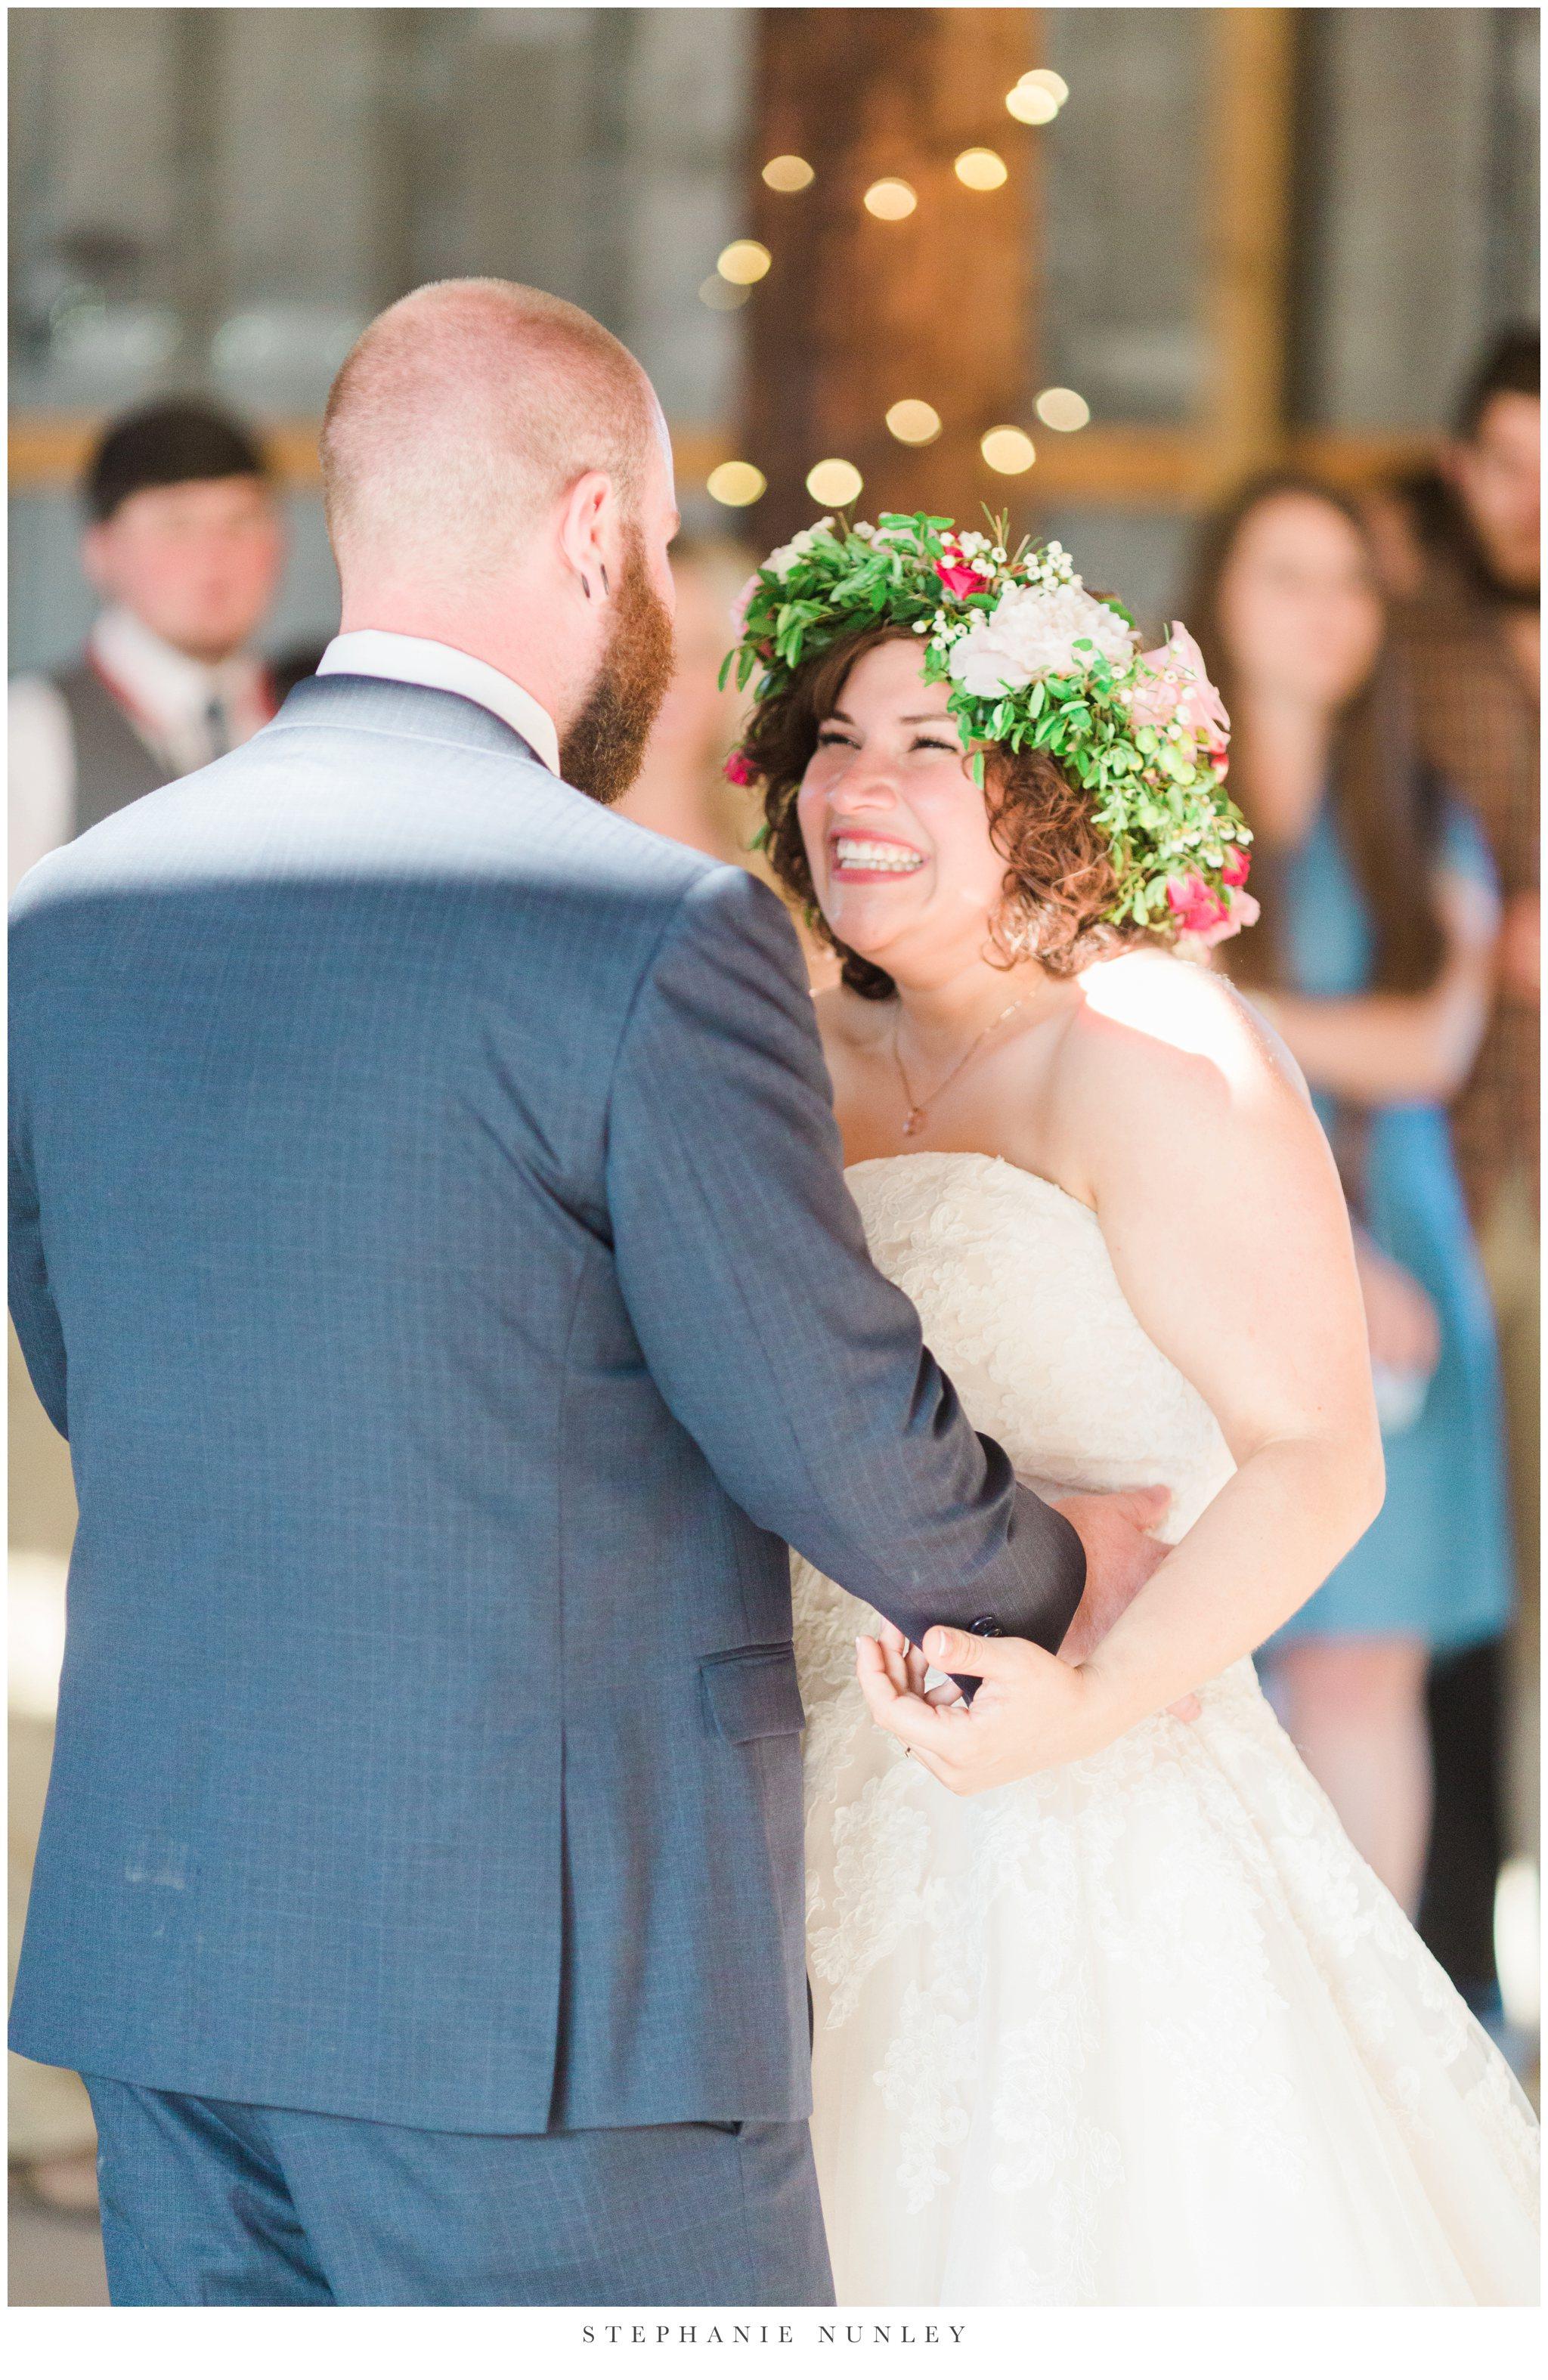 romantic-outdoor-wedding-with-flower-crown-0134.jpg